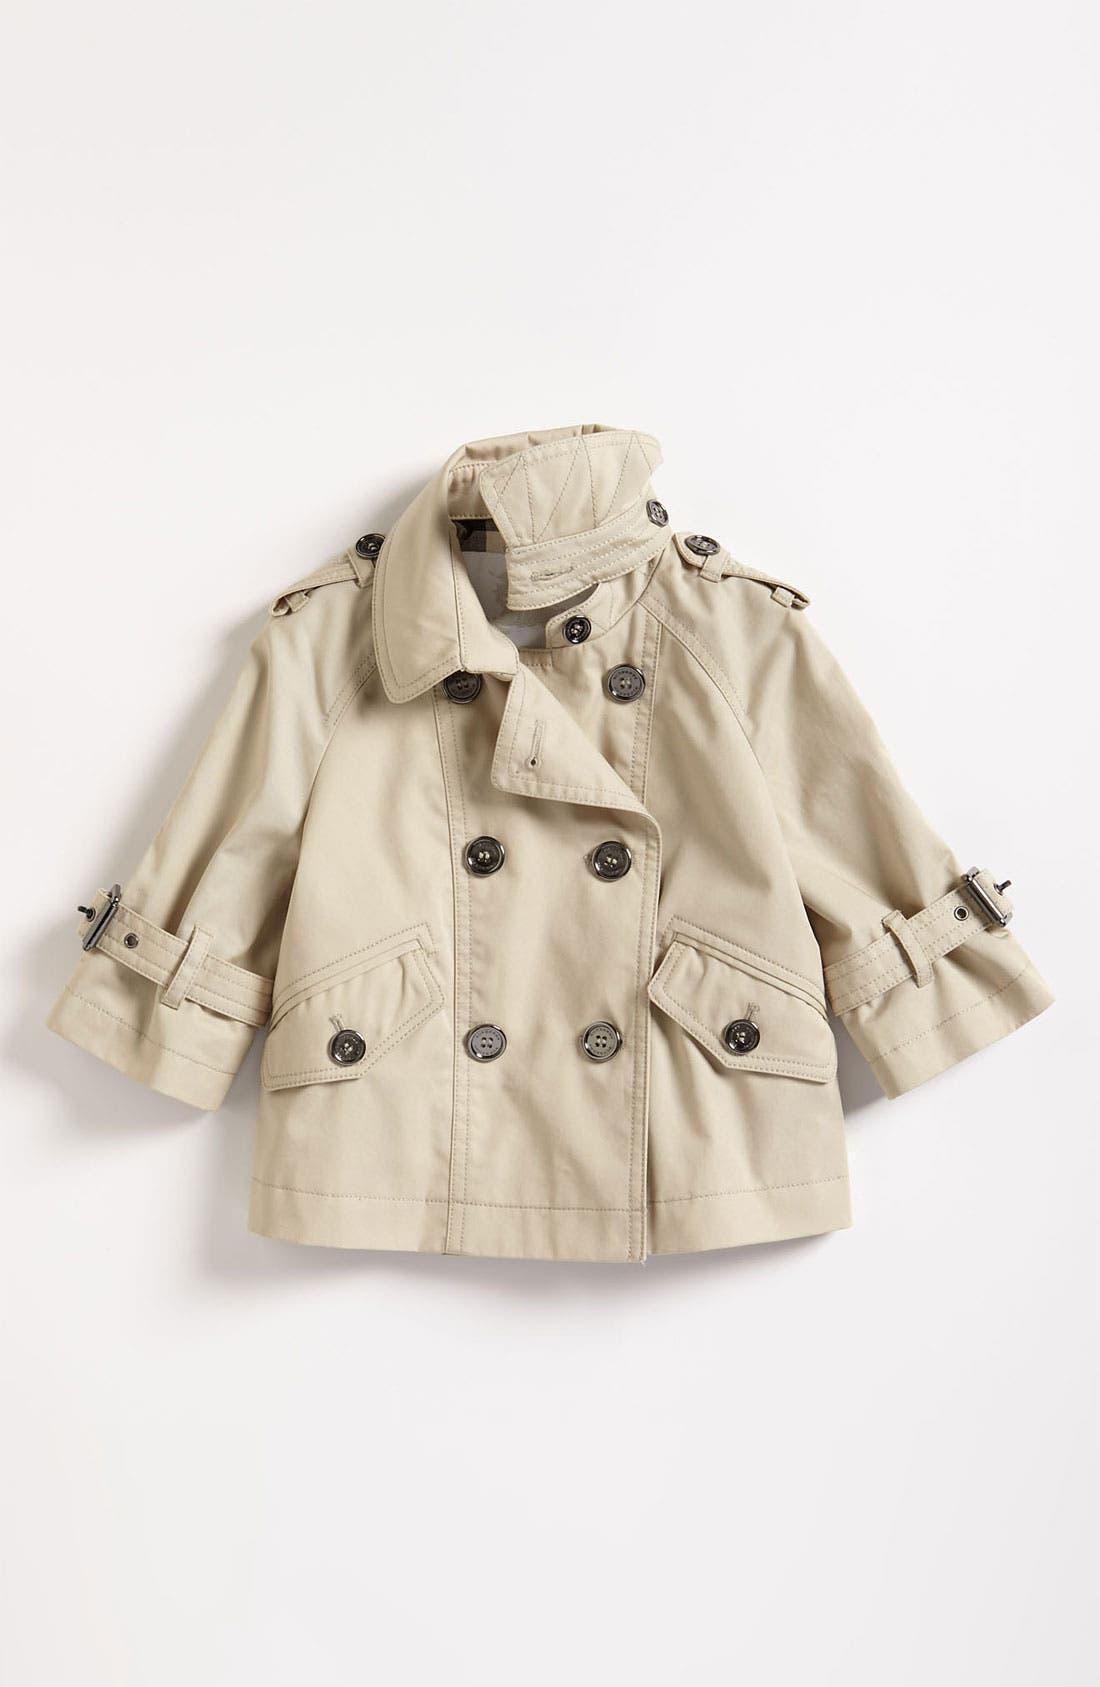 Alternate Image 1 Selected - Burberry Jacket (Toddler)